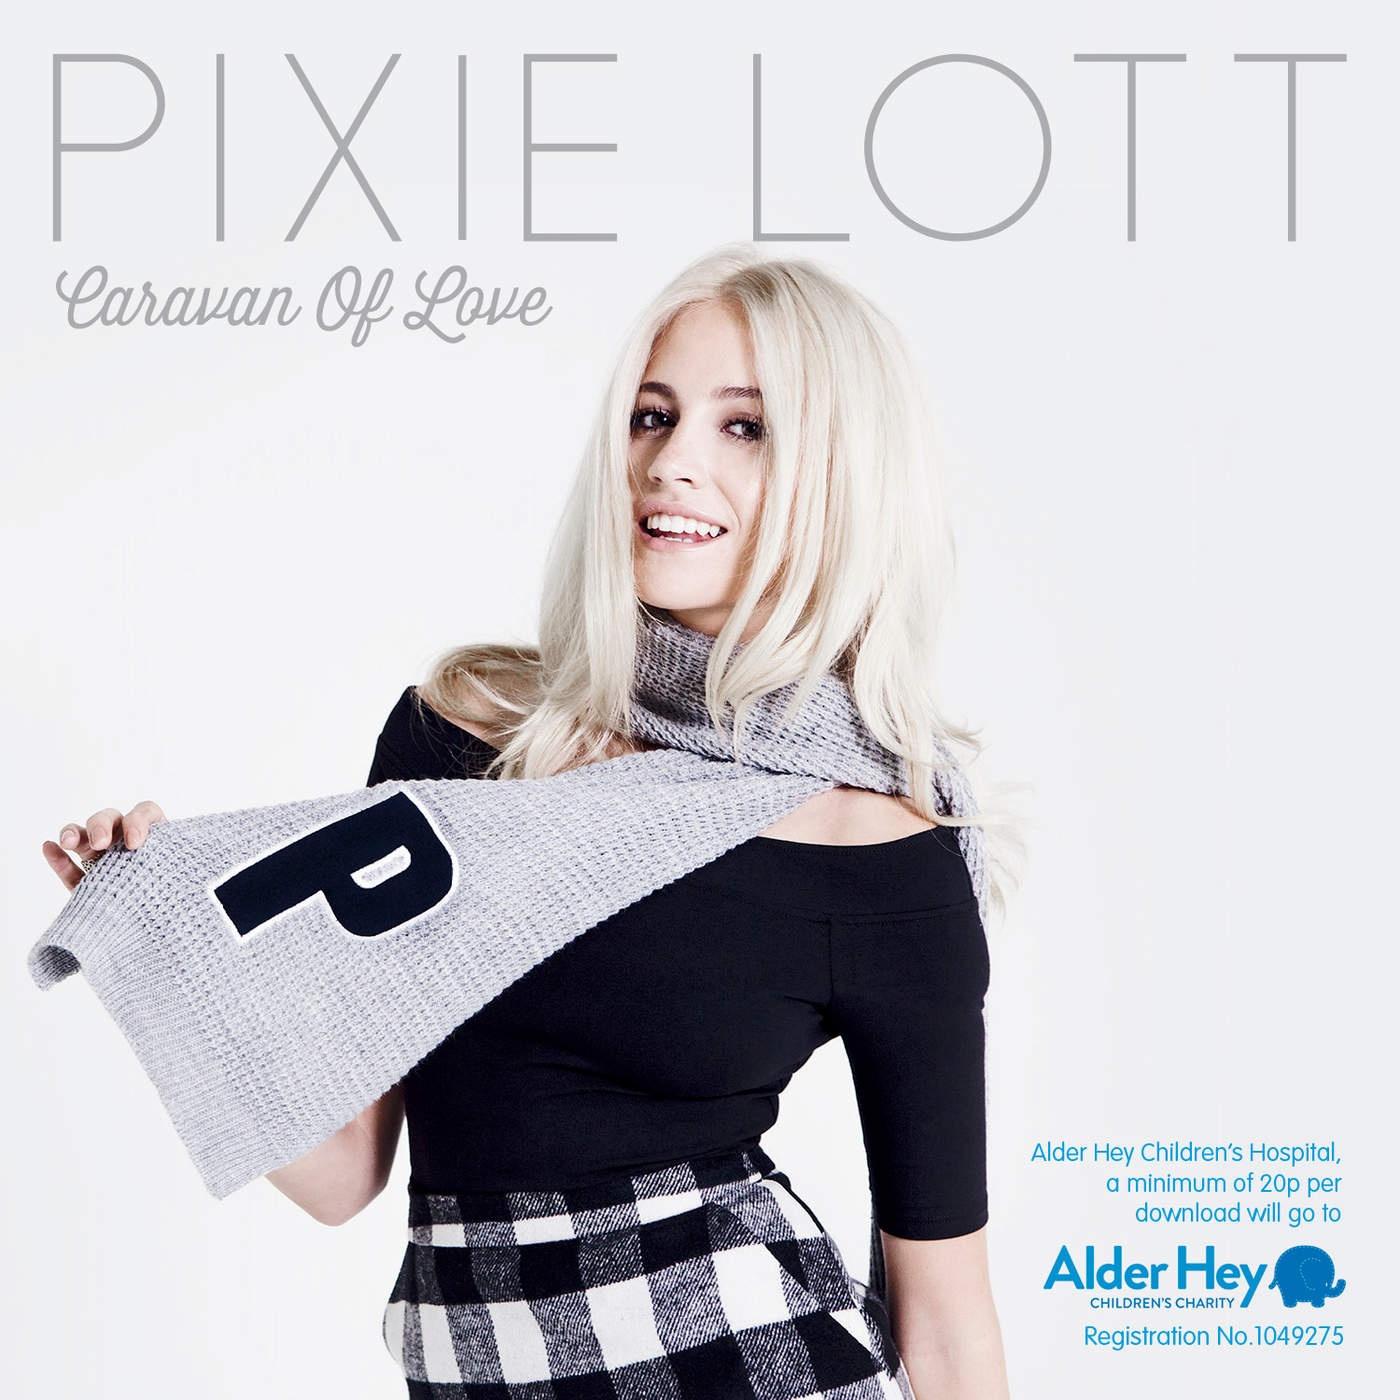 [10's] Pixie Lott - Caravan of Love (2014) Pixie%20Lott%20-%20Caravan%20of%20Love